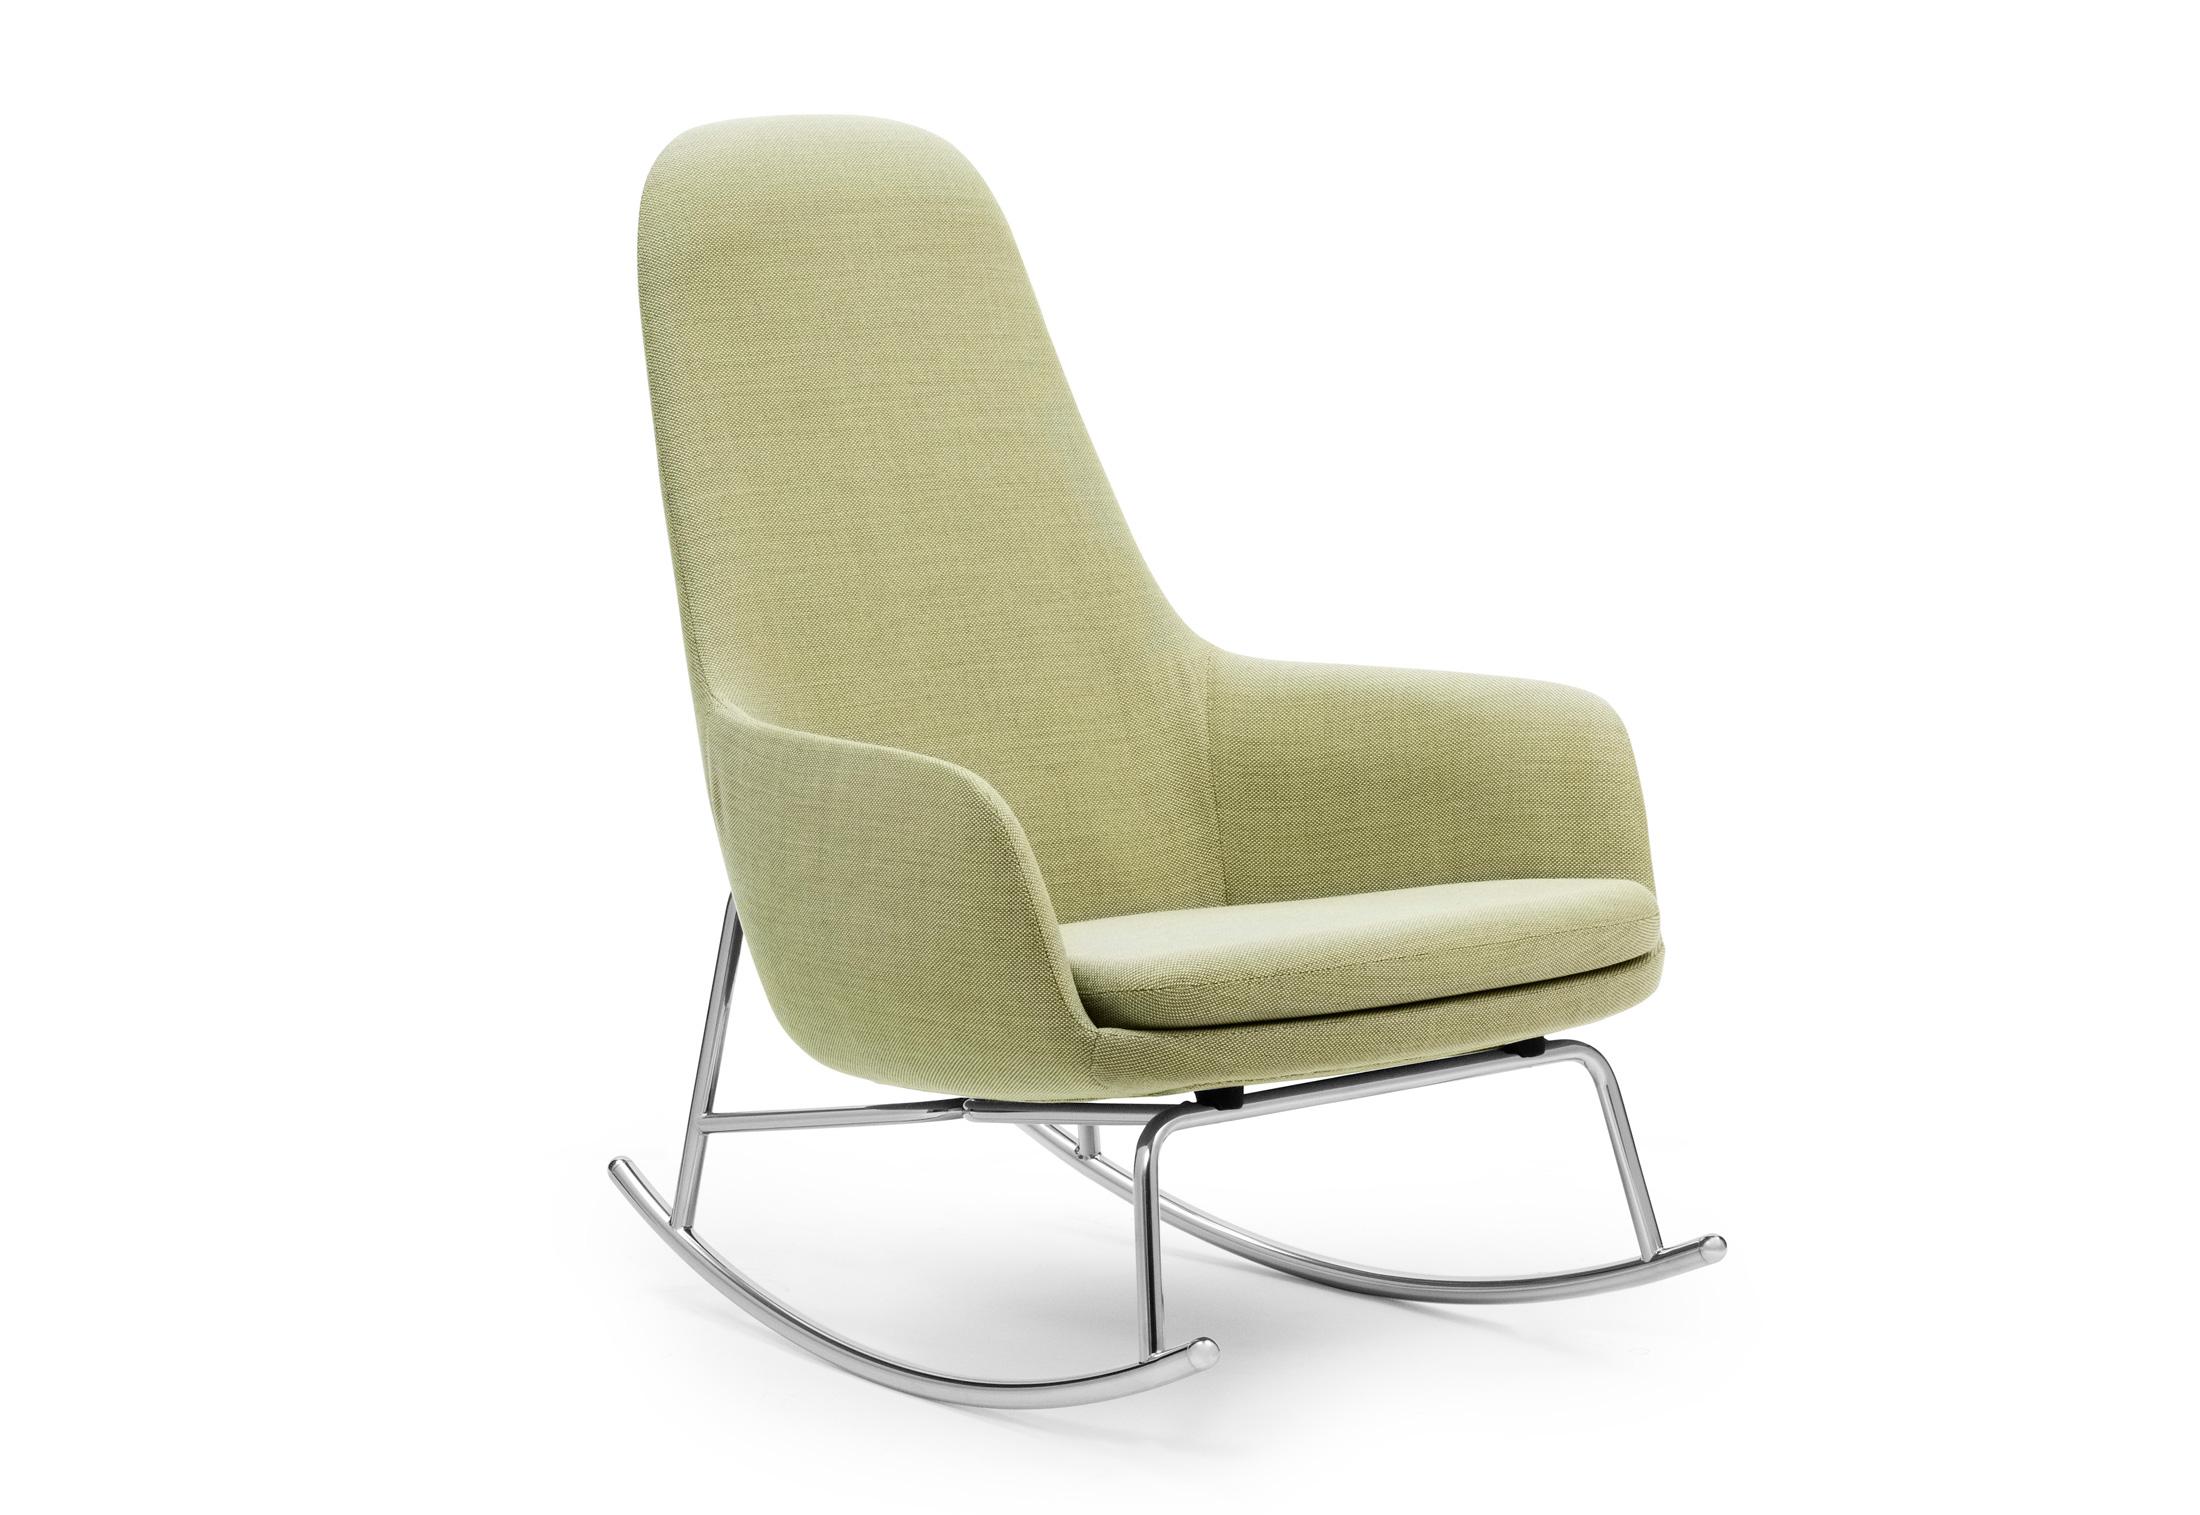 Phenomenal Era Rocking Chair High By Normann Copenhagen Stylepark Creativecarmelina Interior Chair Design Creativecarmelinacom